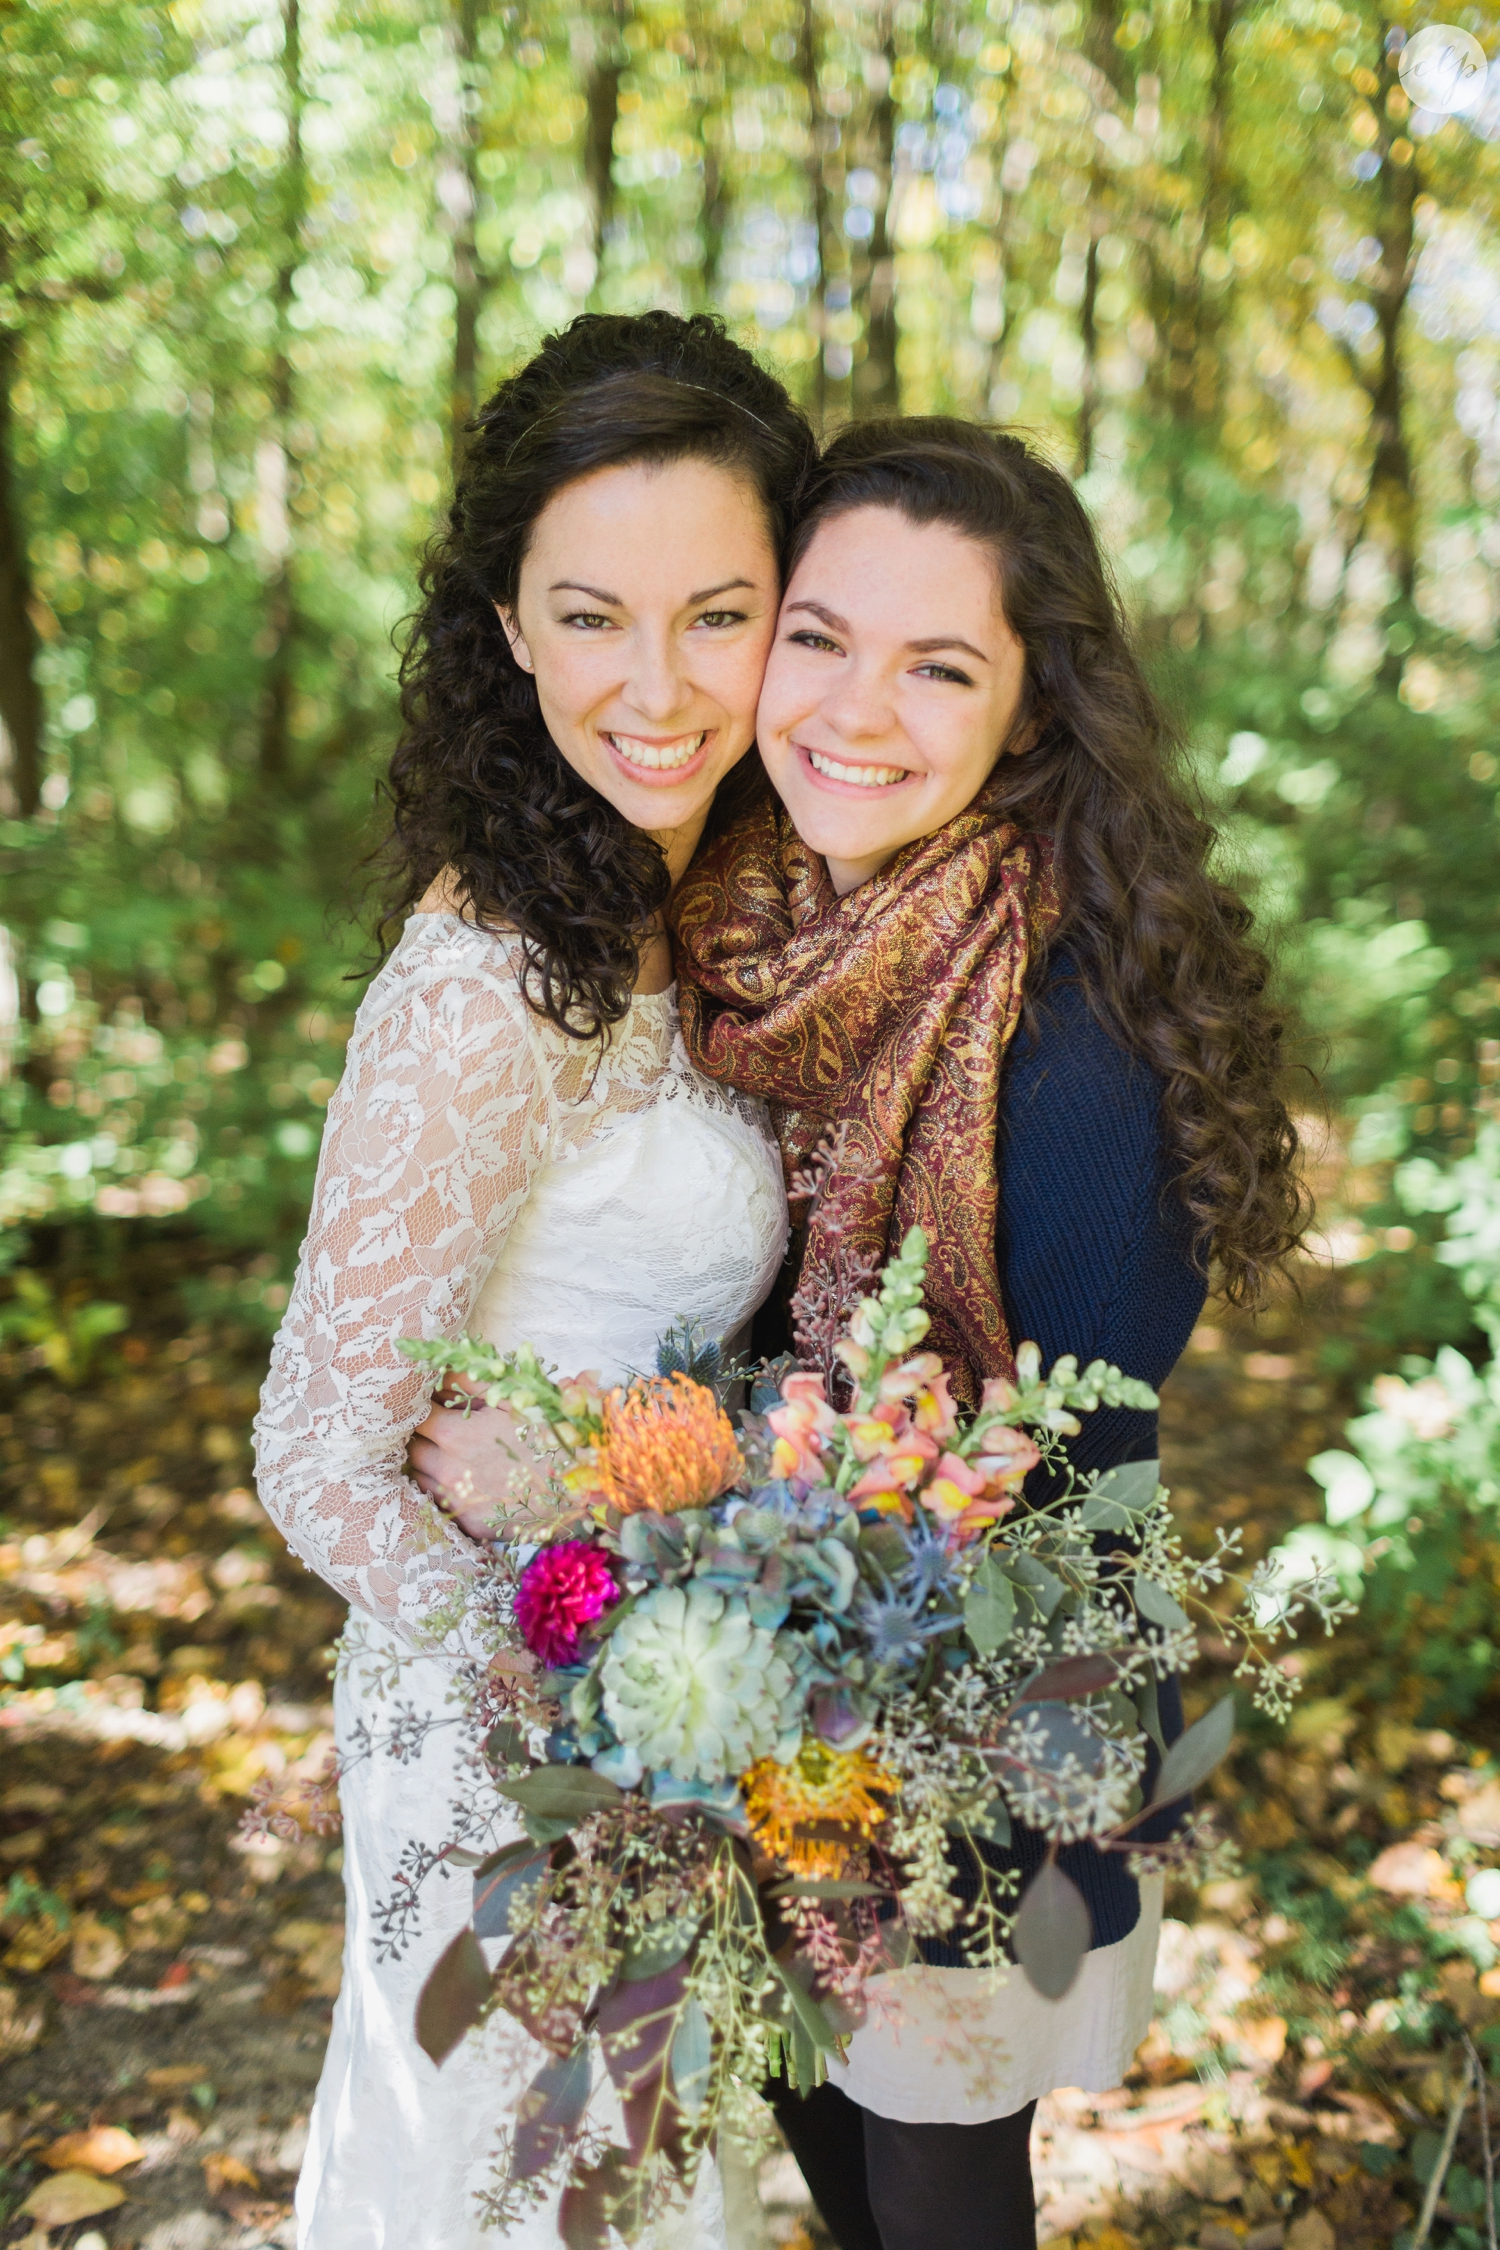 Outdoor-Wedding-in-the-Woods-Photography_4182.jpg